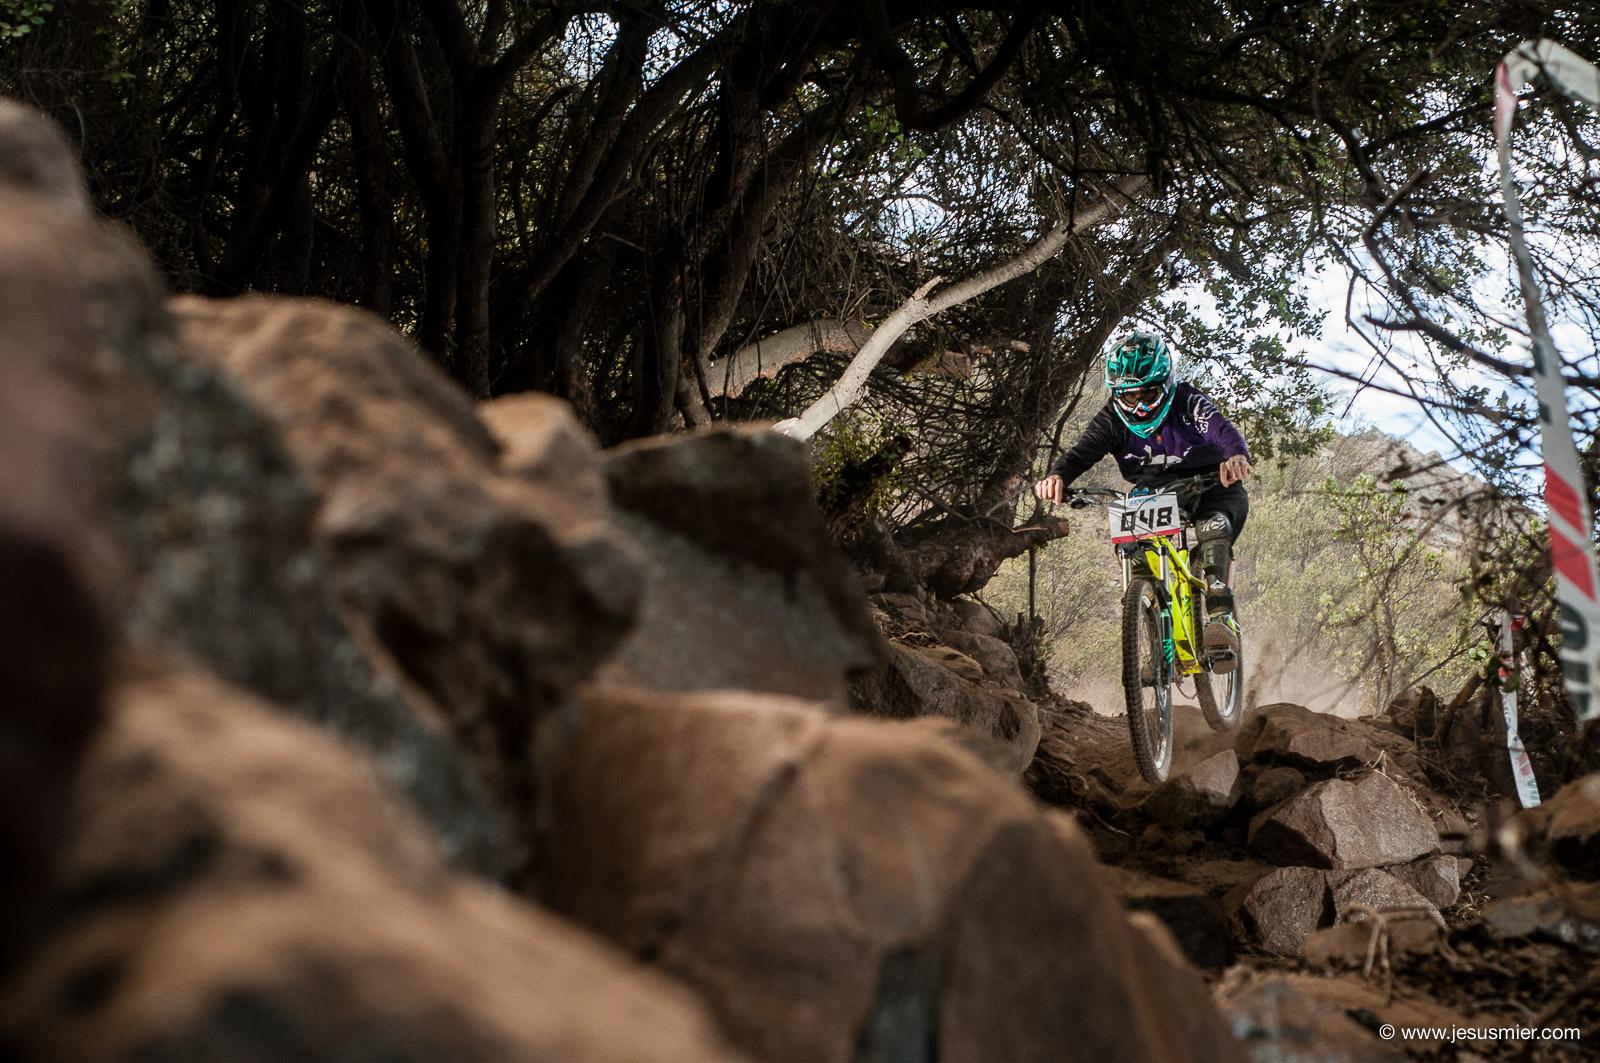 Rocatemu 2015, Rider: Erian Acevedo - Foto: Jesus Mier